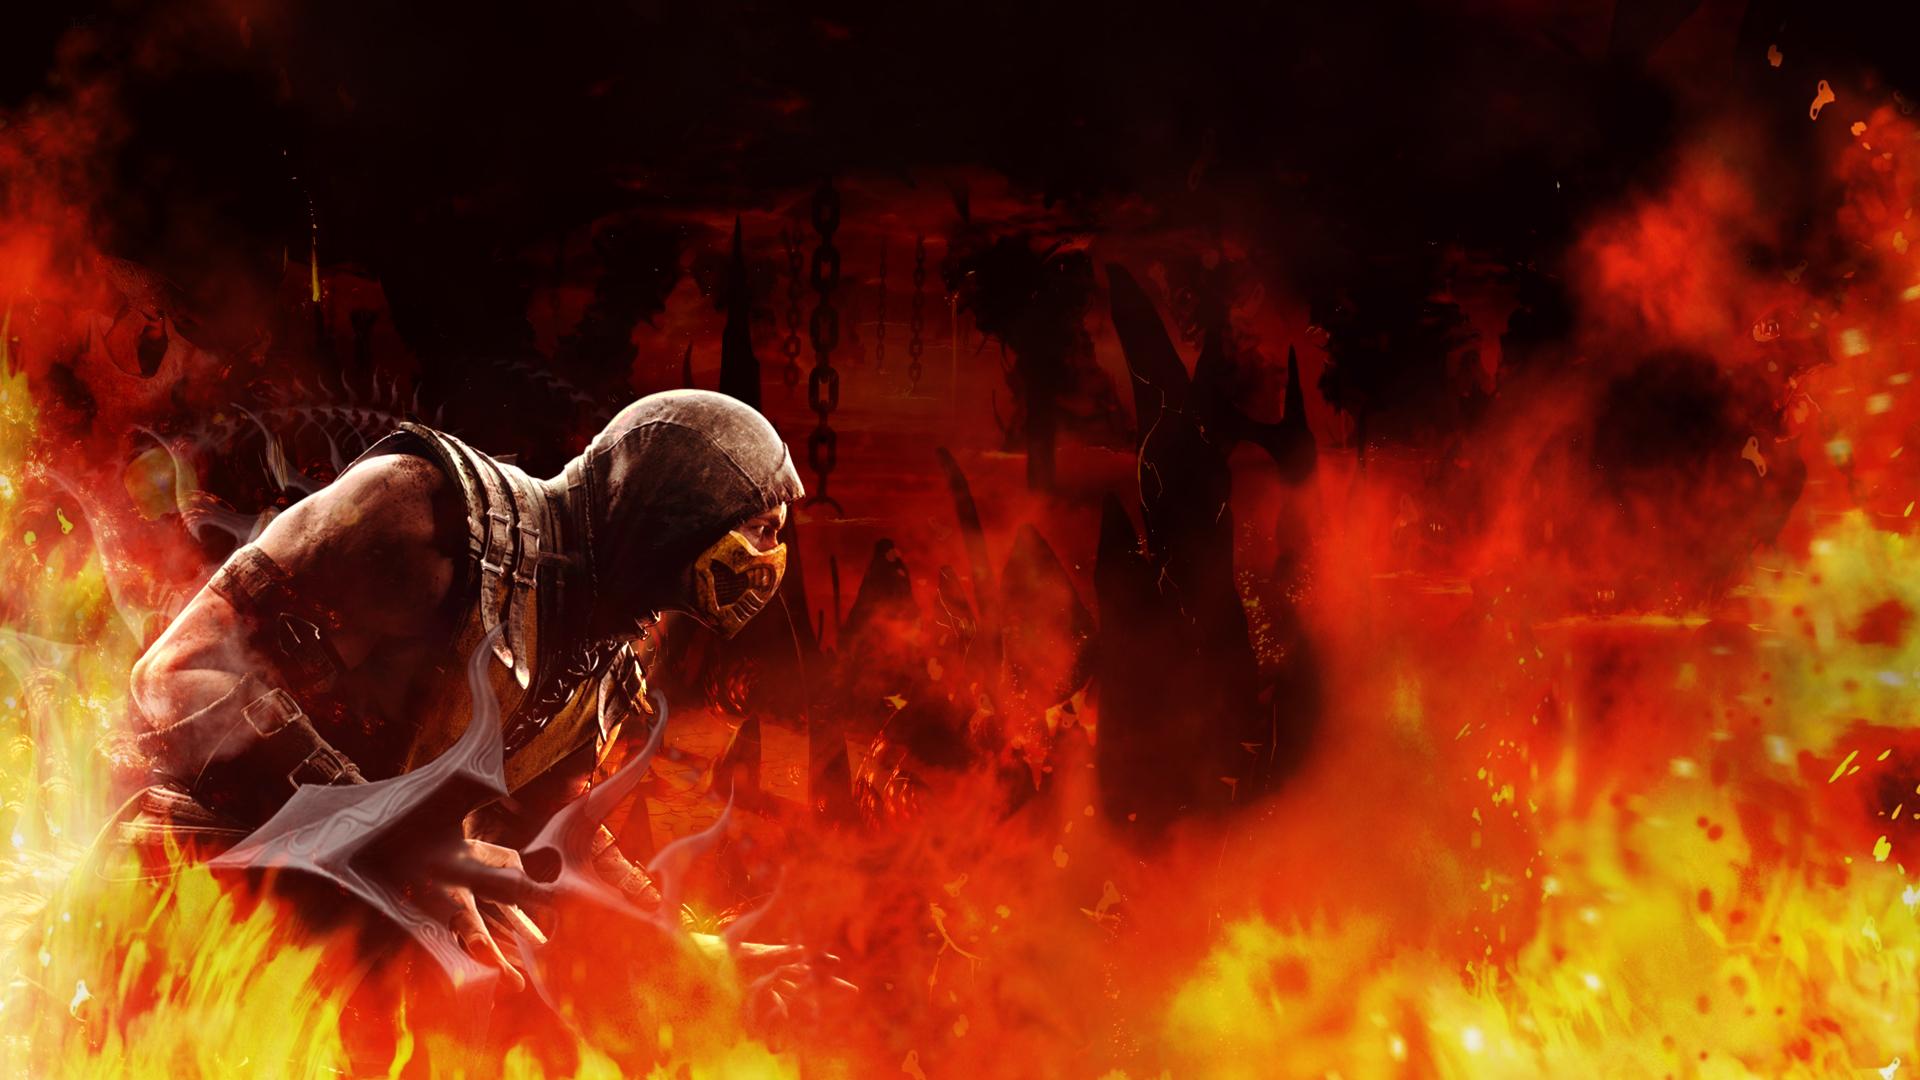 Mortal Kombat X Scorpion Wallpaper 1920 X 1080 By Kothanos On